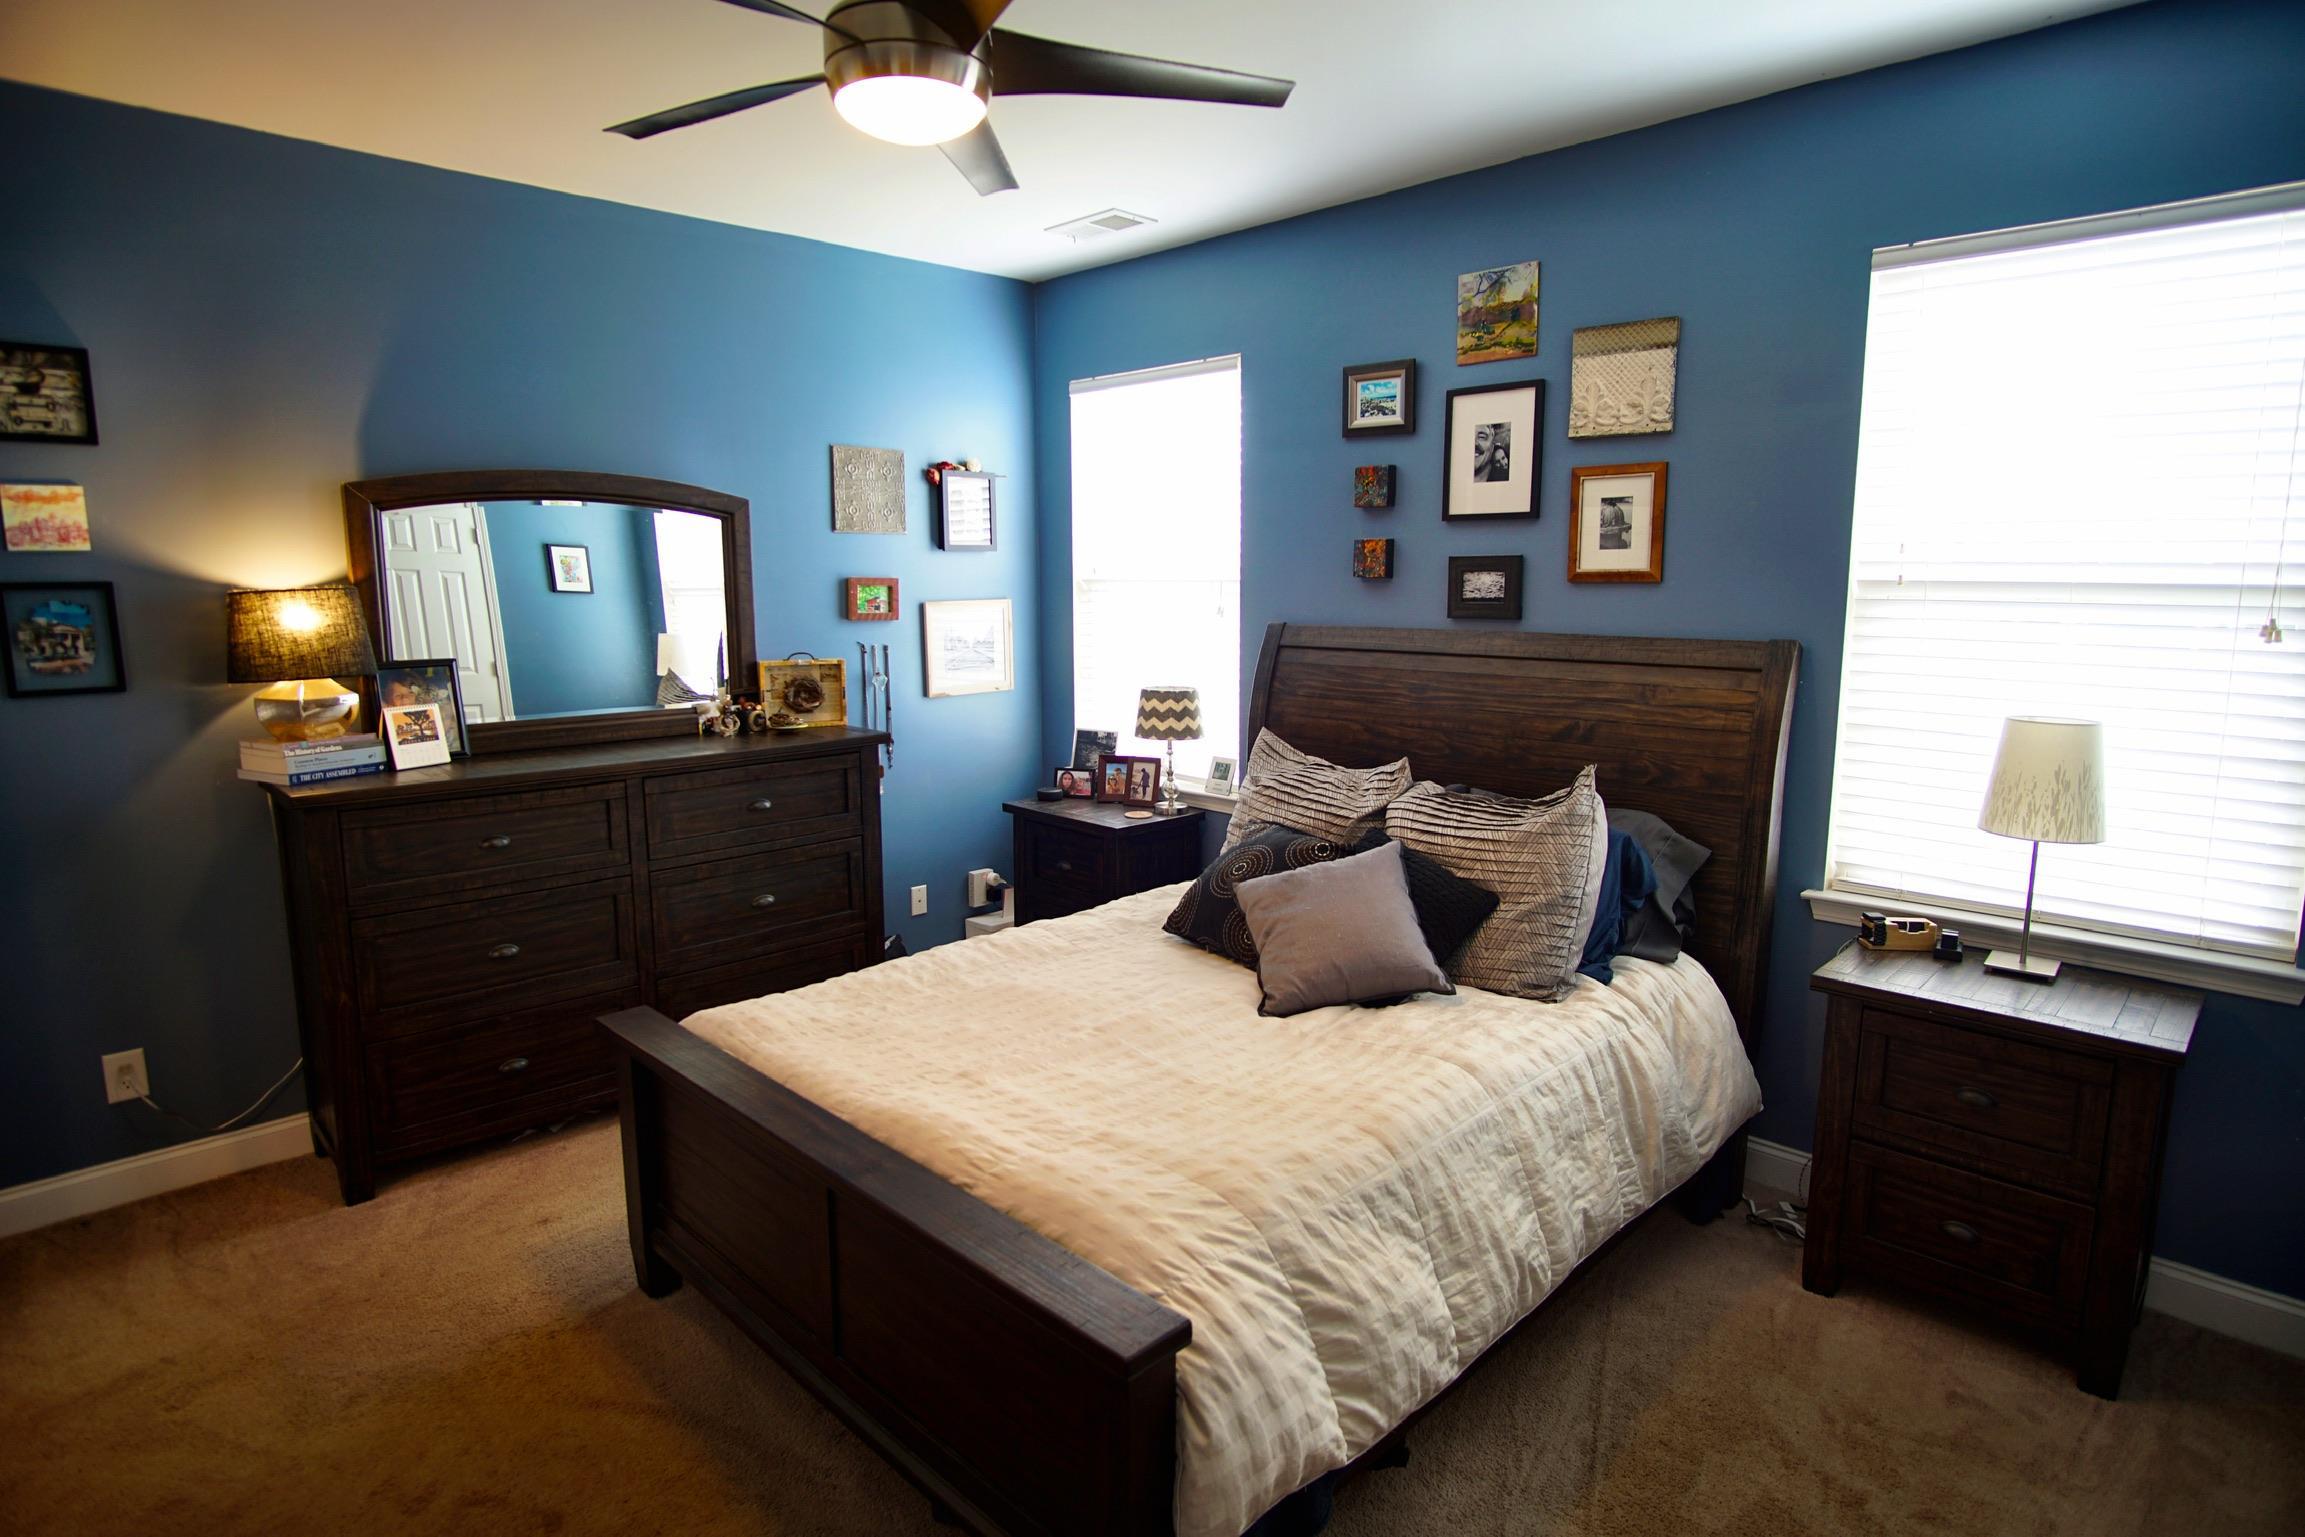 Colony North II Homes For Sale - 7828 Magellan, North Charleston, SC - 13